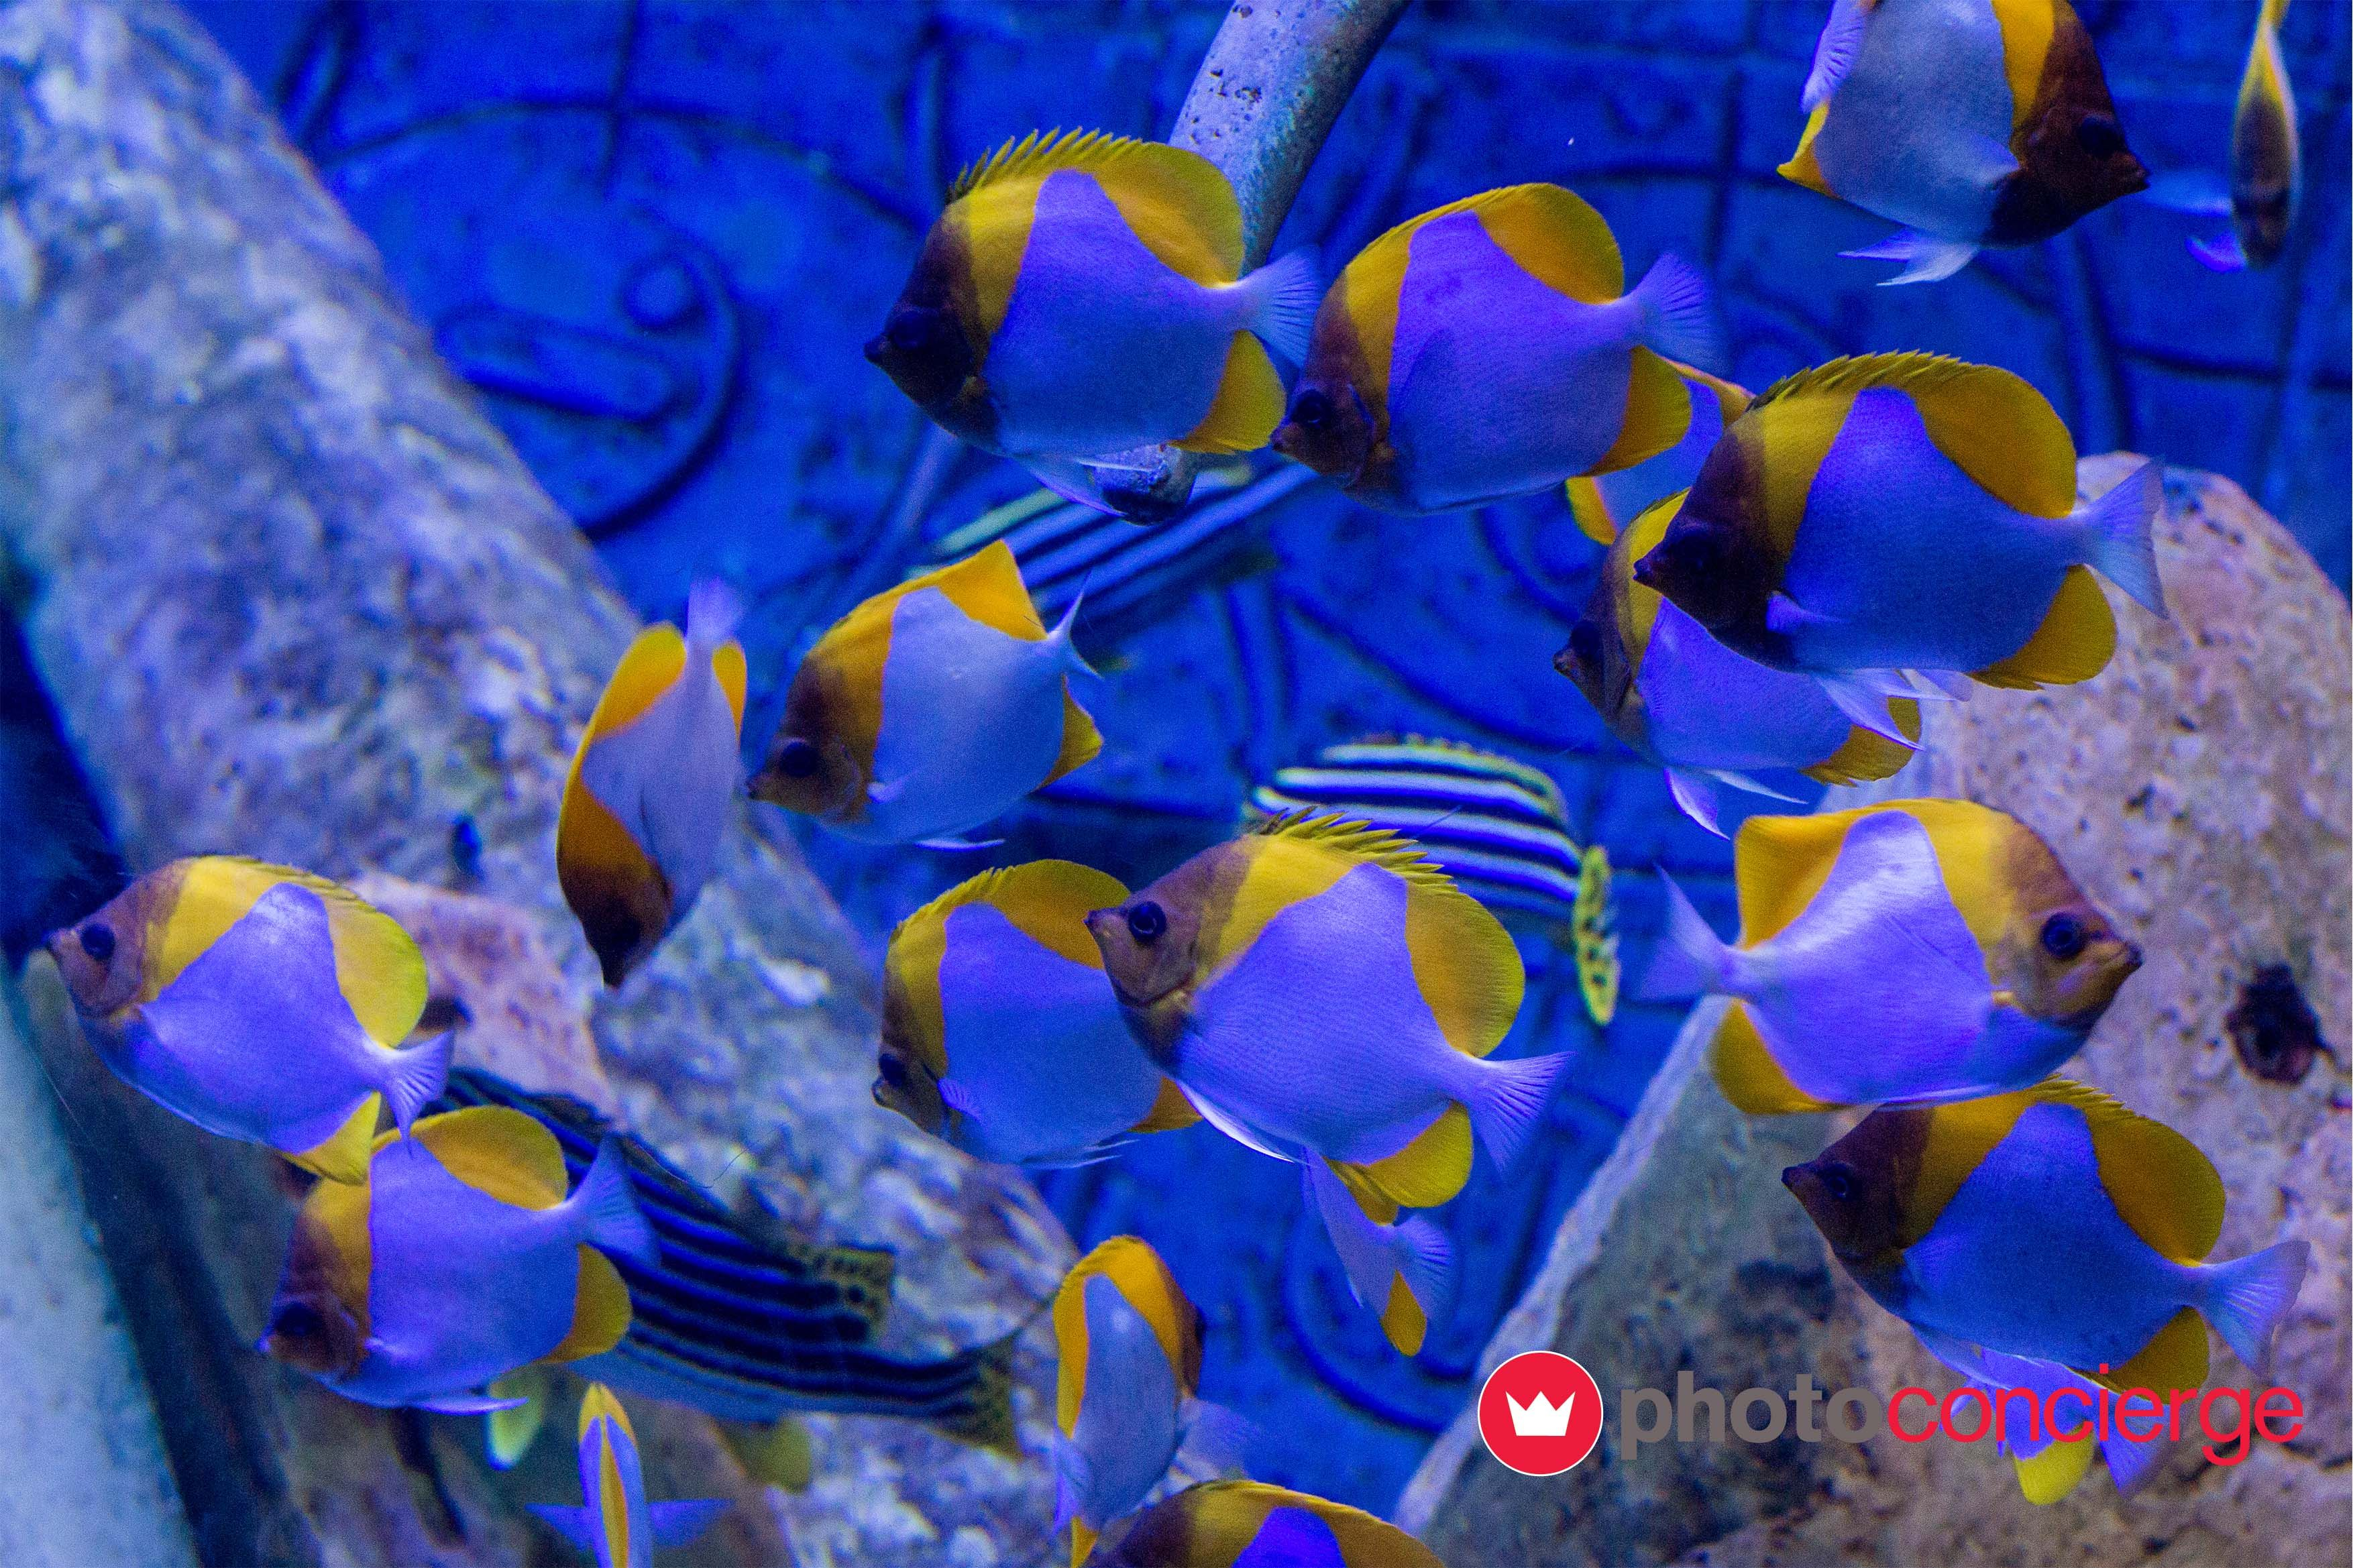 #sea wonders !!  #photoconcierge #photography #stockphoto #marine #sealife #fishes